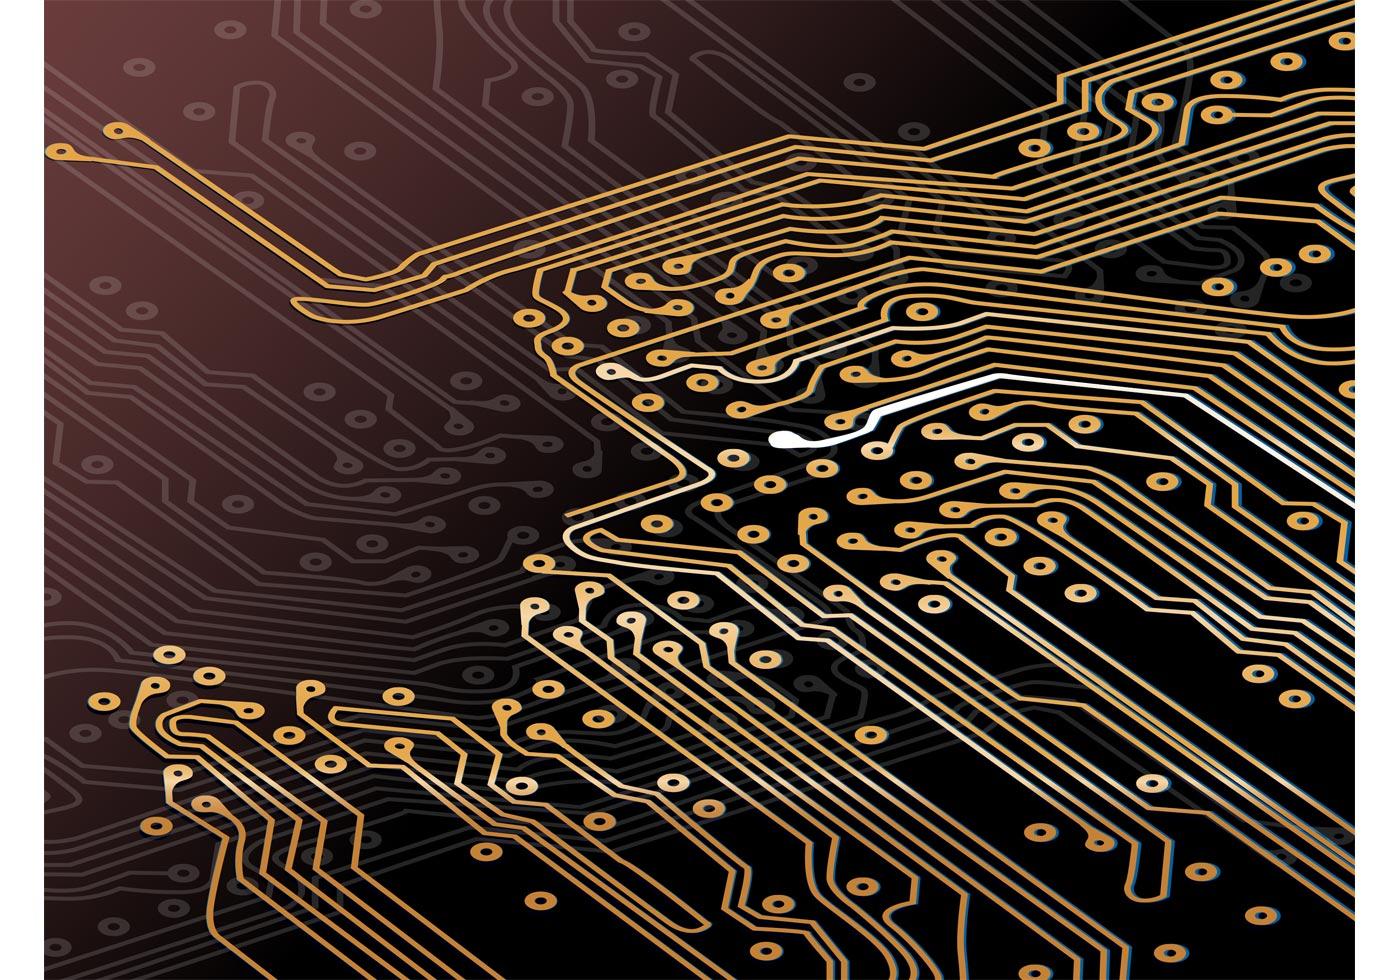 Motherboard Circuit Illustration: Download Free Vector Art, Stock Graphics